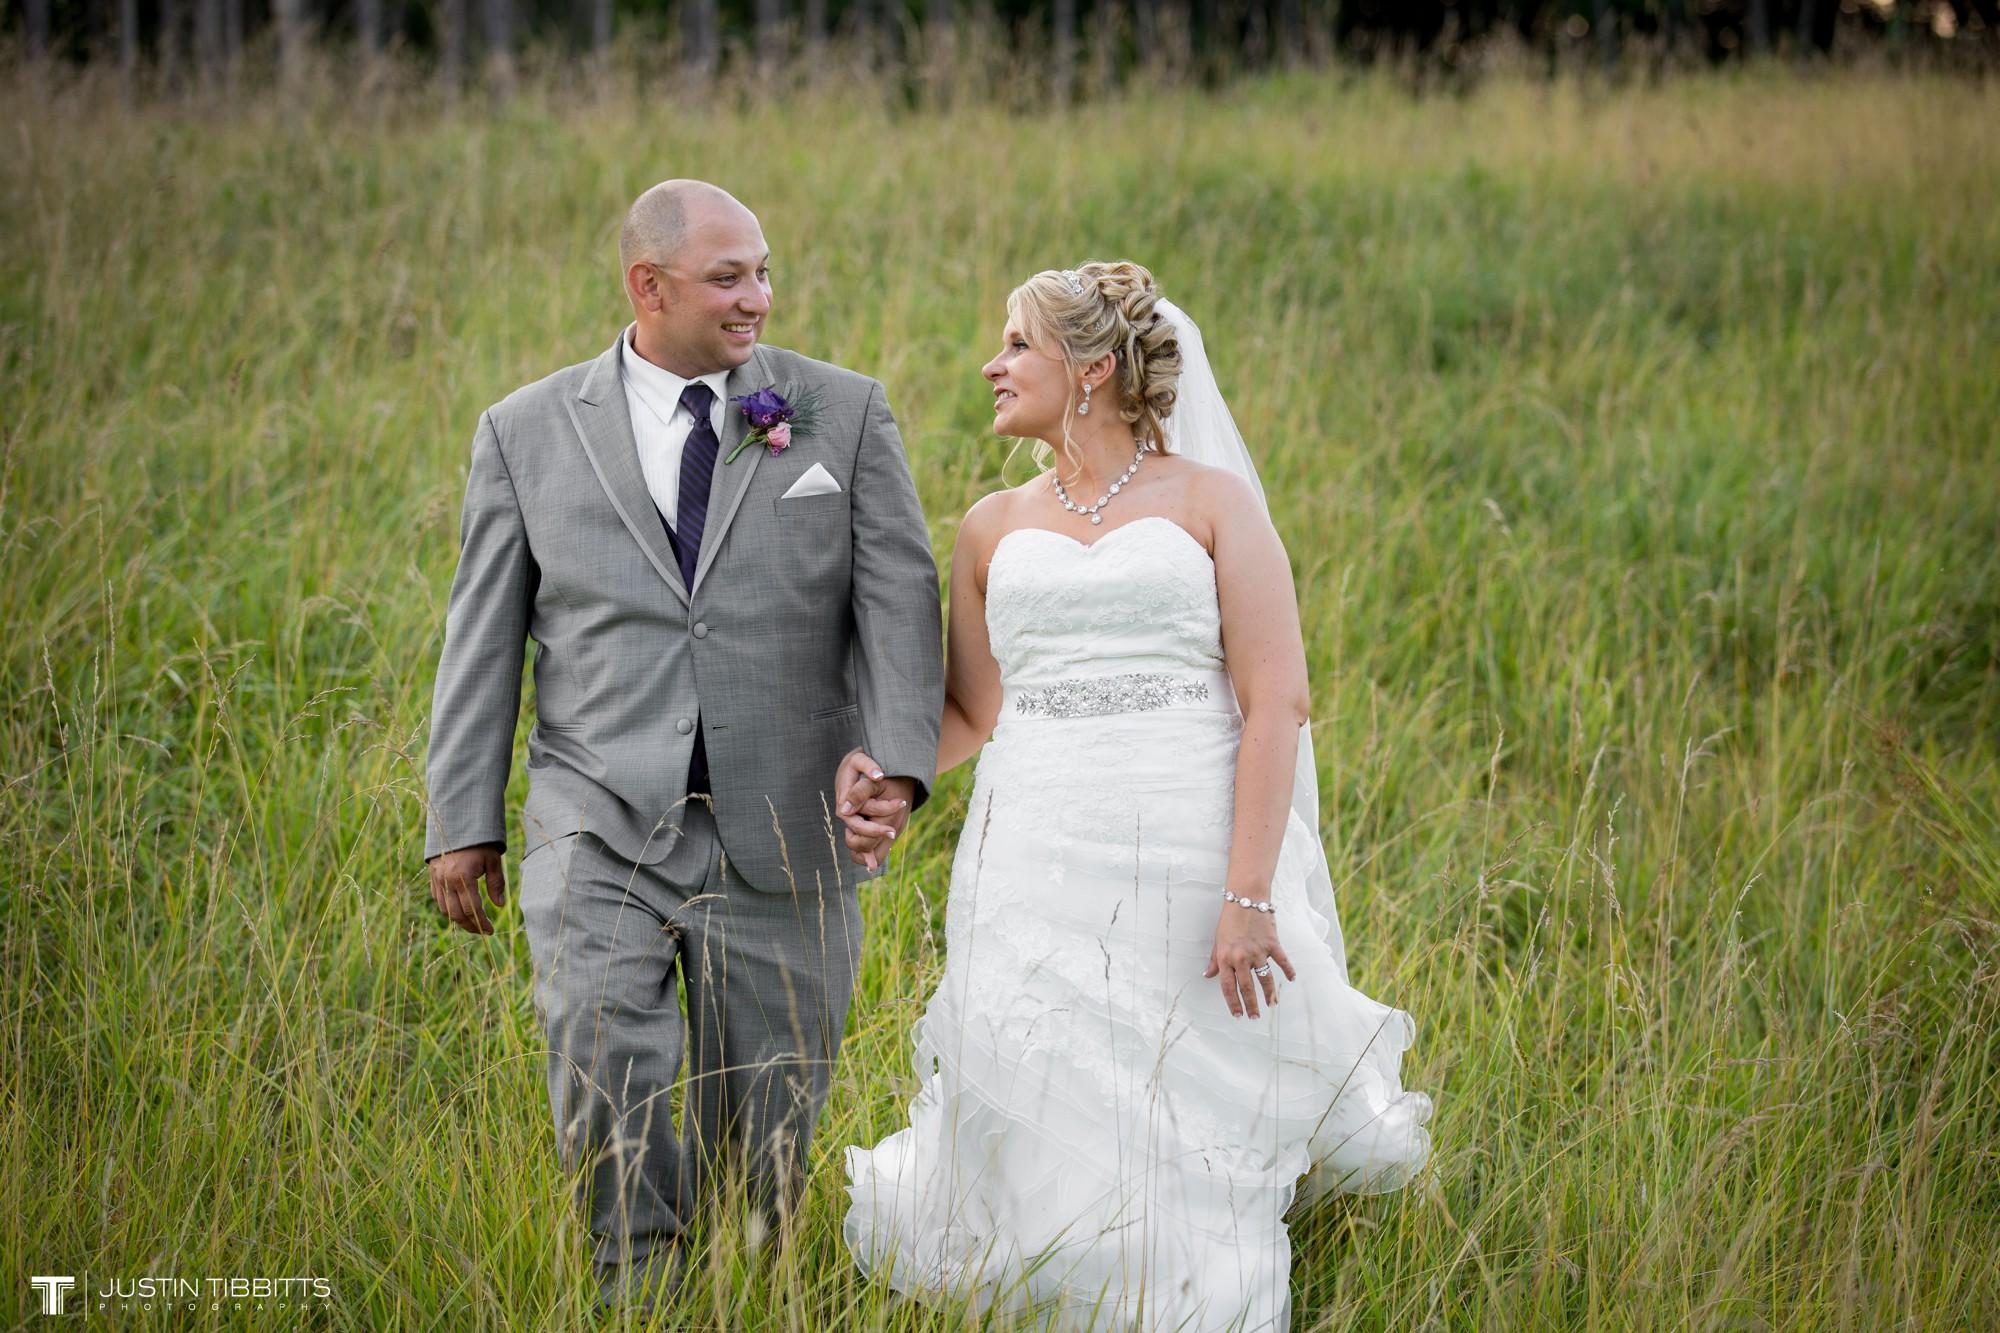 Justin Tibbitts Photography Mr and Mrs Bradley Blog_0079